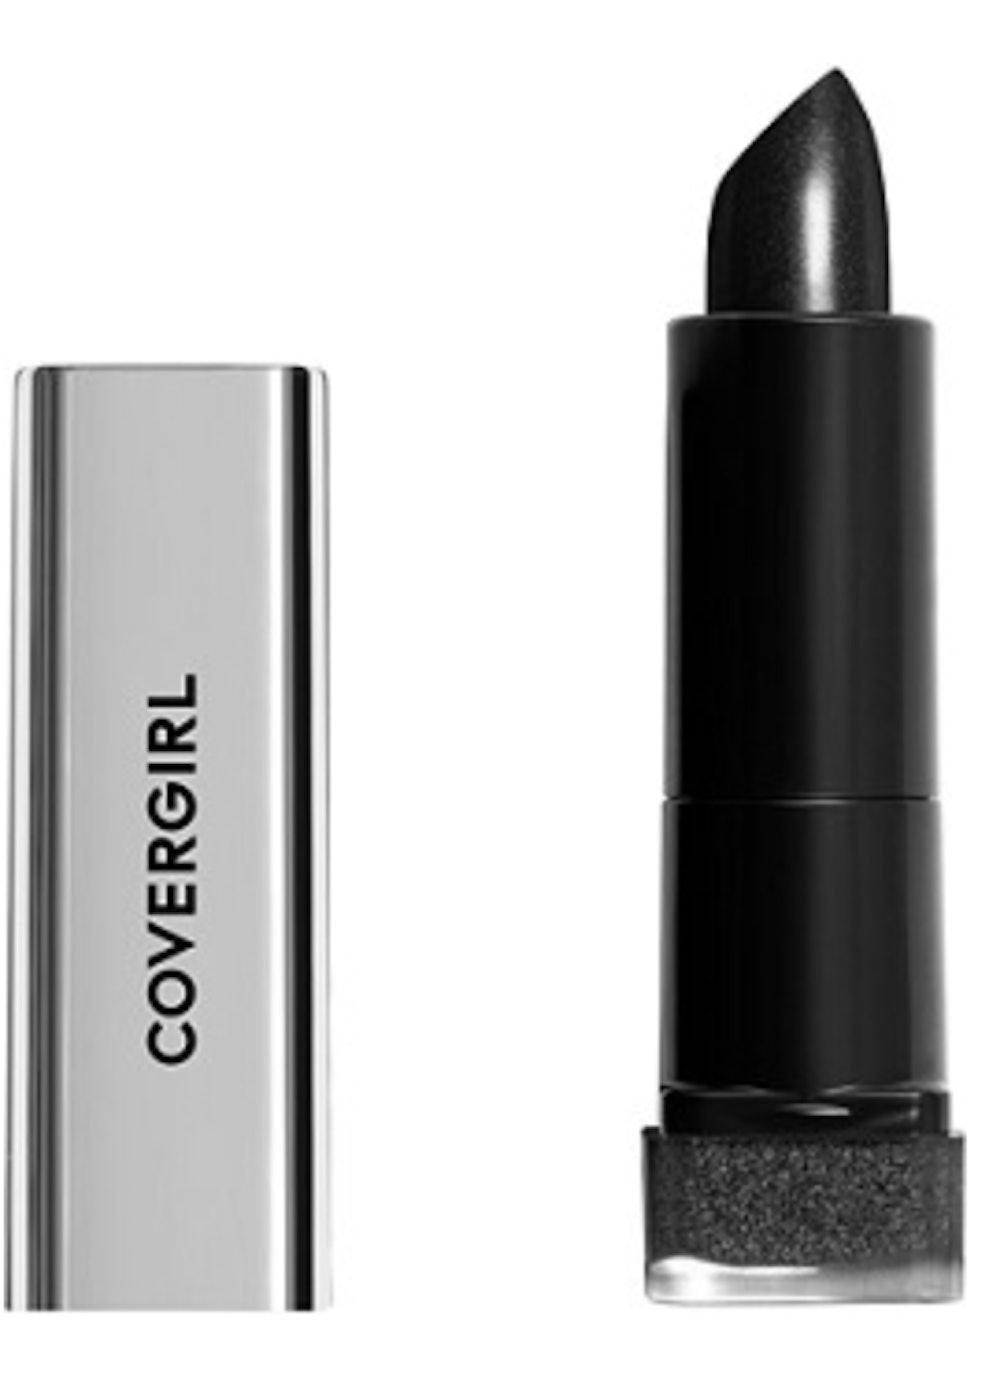 CoverGirl Exhibitionist Metallic Lipstick